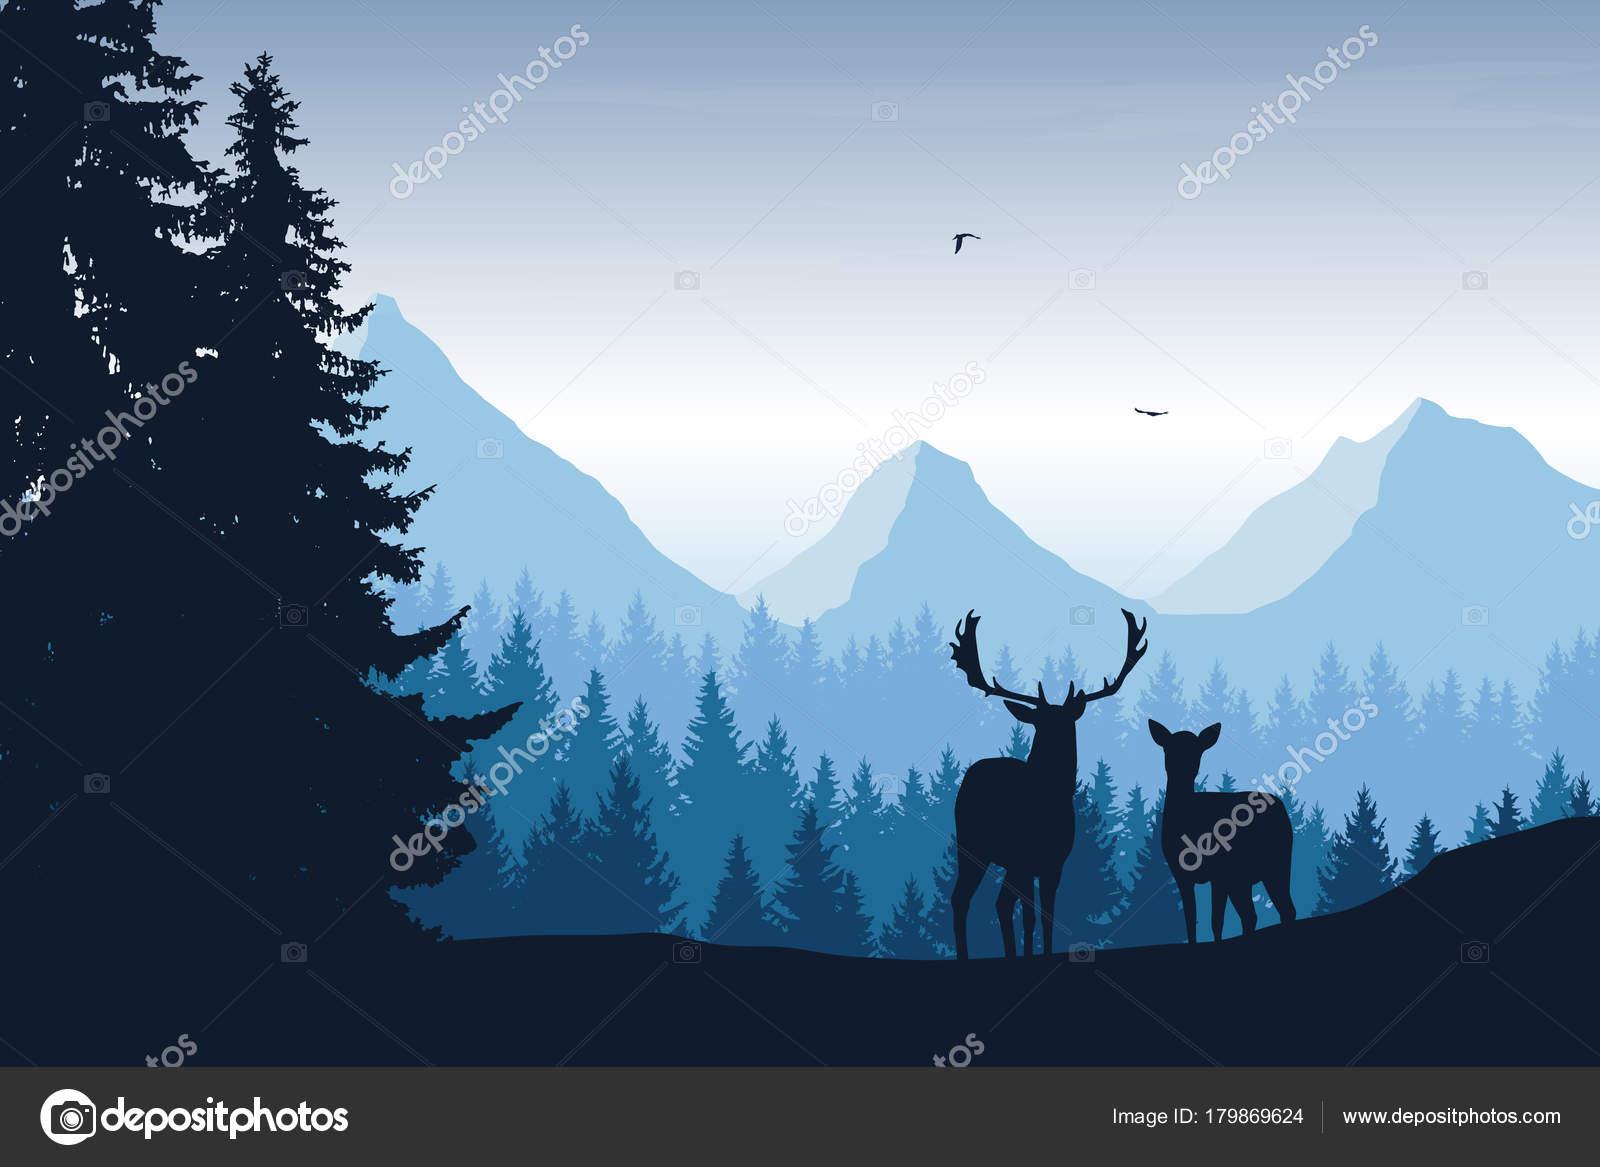 Imagenes Dibujo De Paisaje Natural O Realista Ilustracion